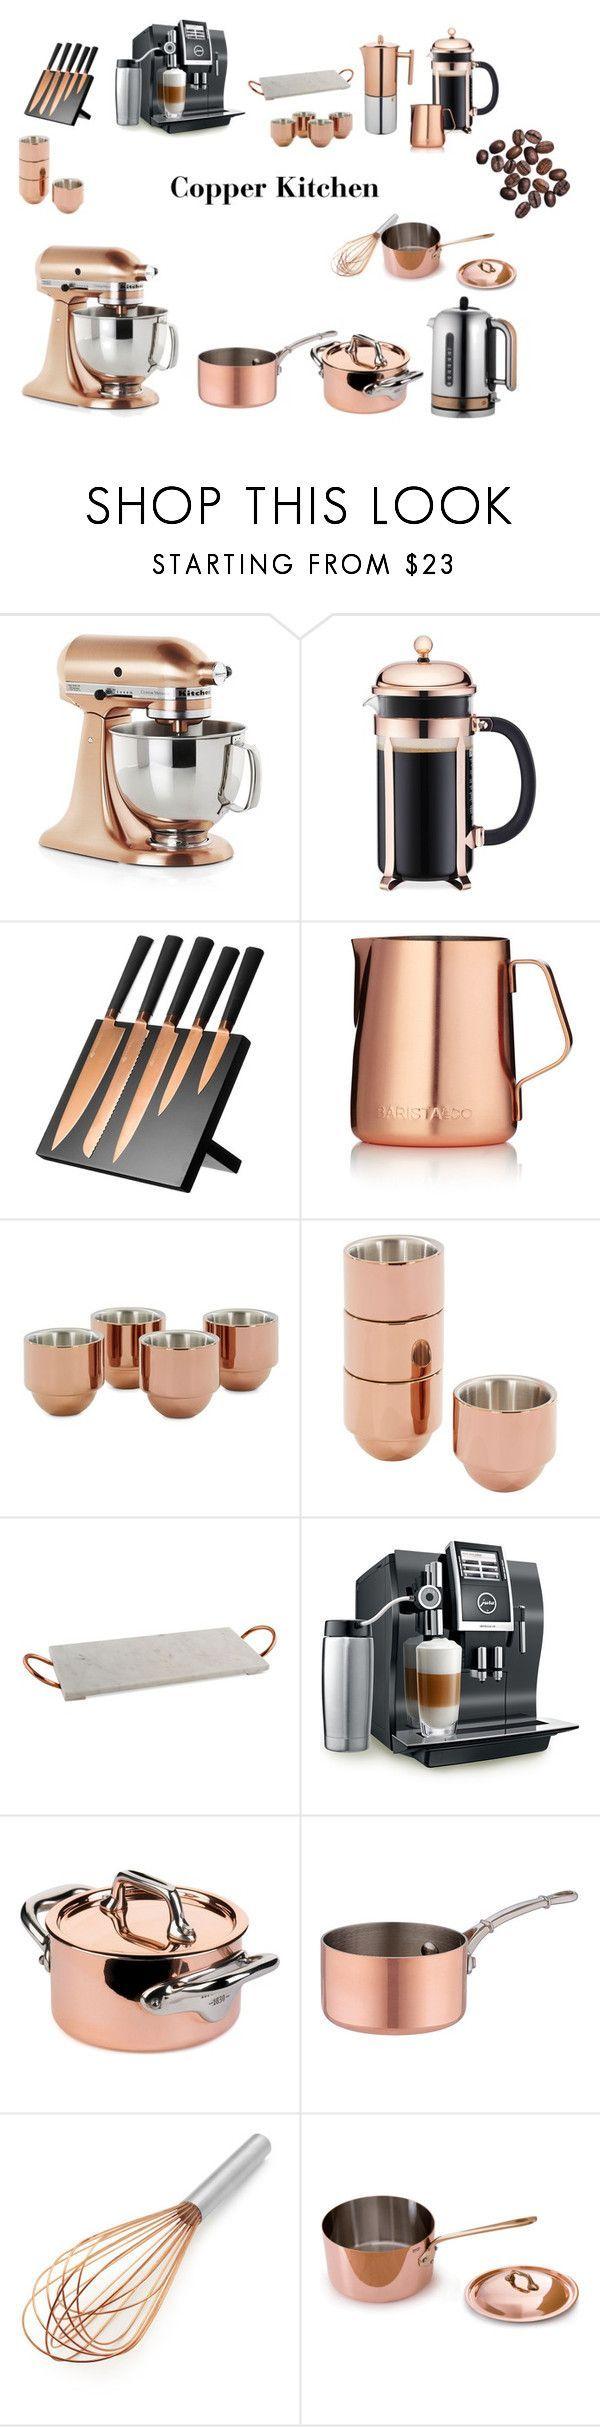 nice Copper Kitchen by http://www.danaz-home-decorations.xyz/home-decor-accessories/copper-kitchen/